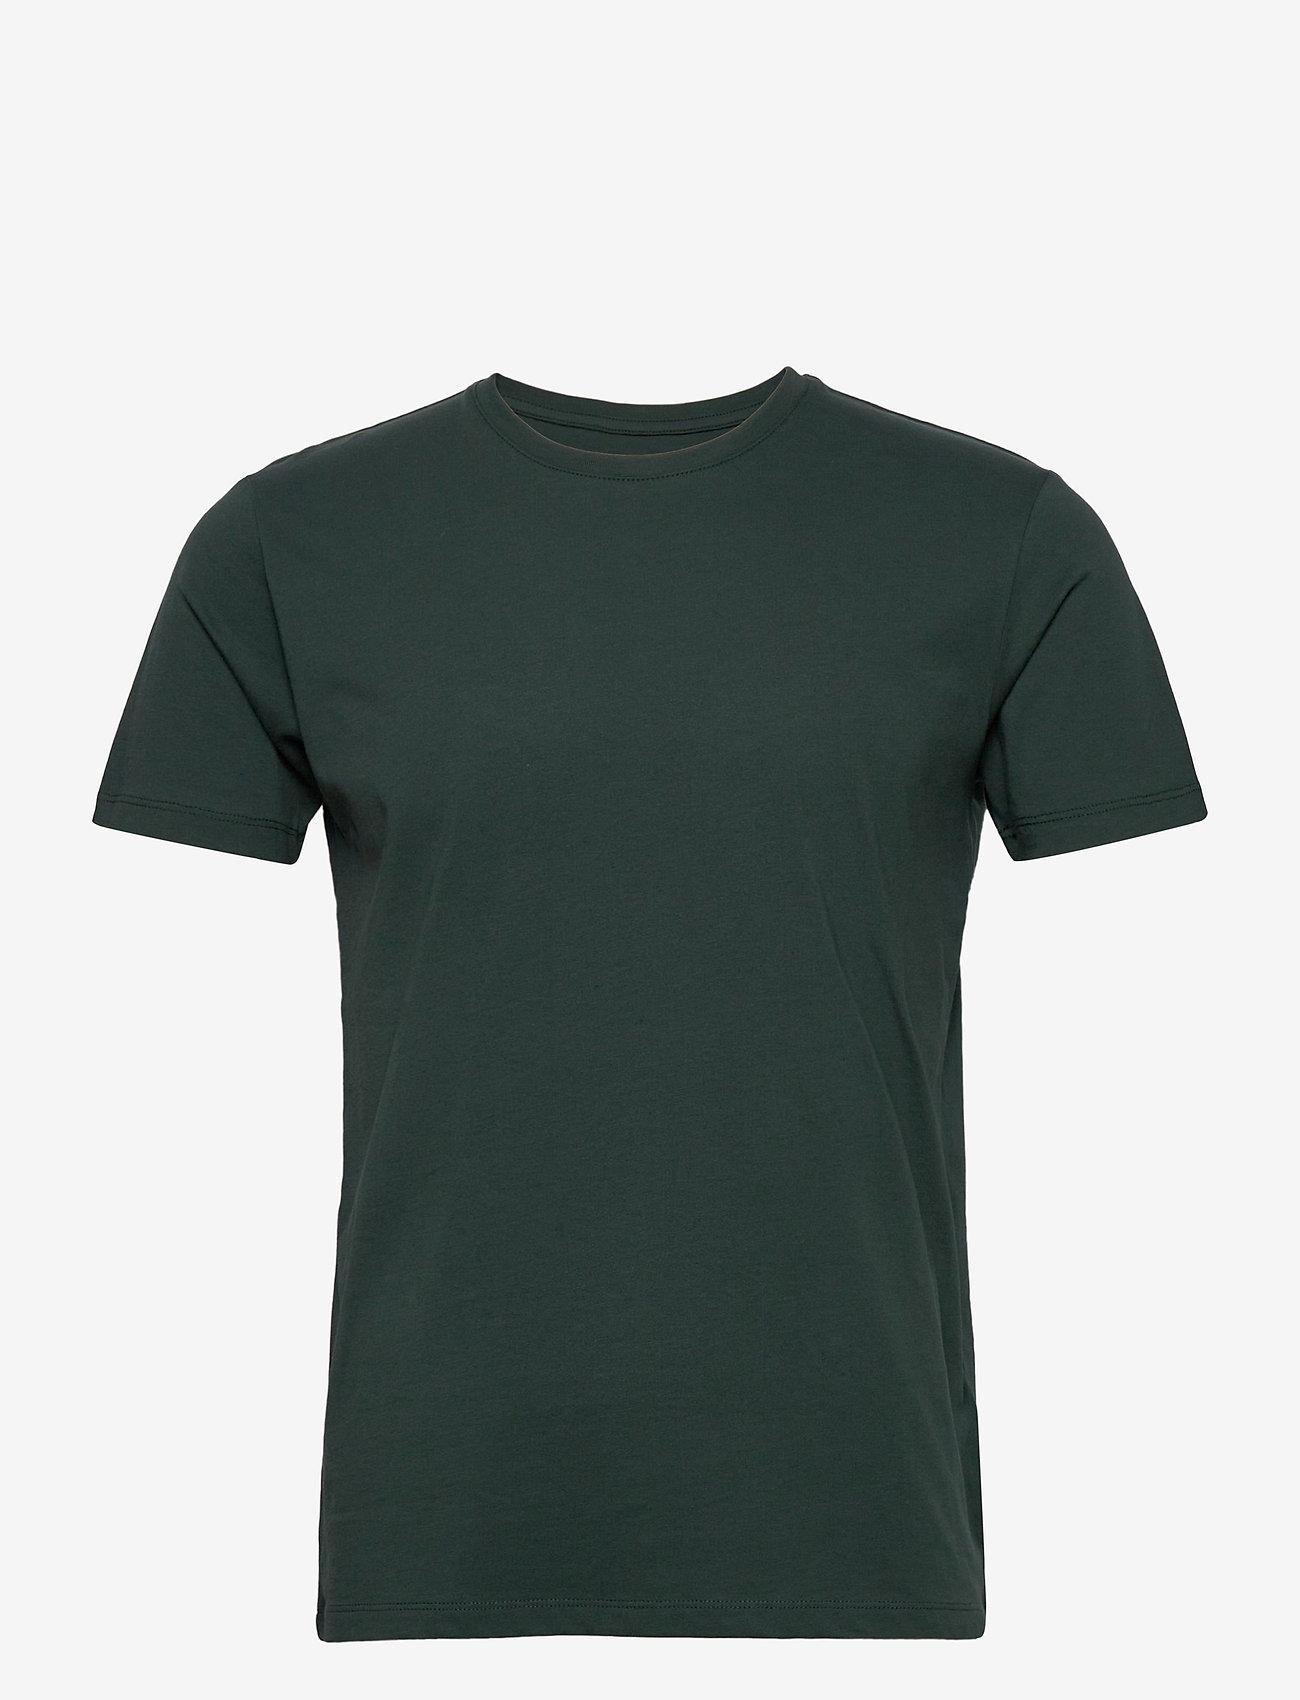 Esprit Casual - T-Shirts - basic t-shirts - teal blue - 0